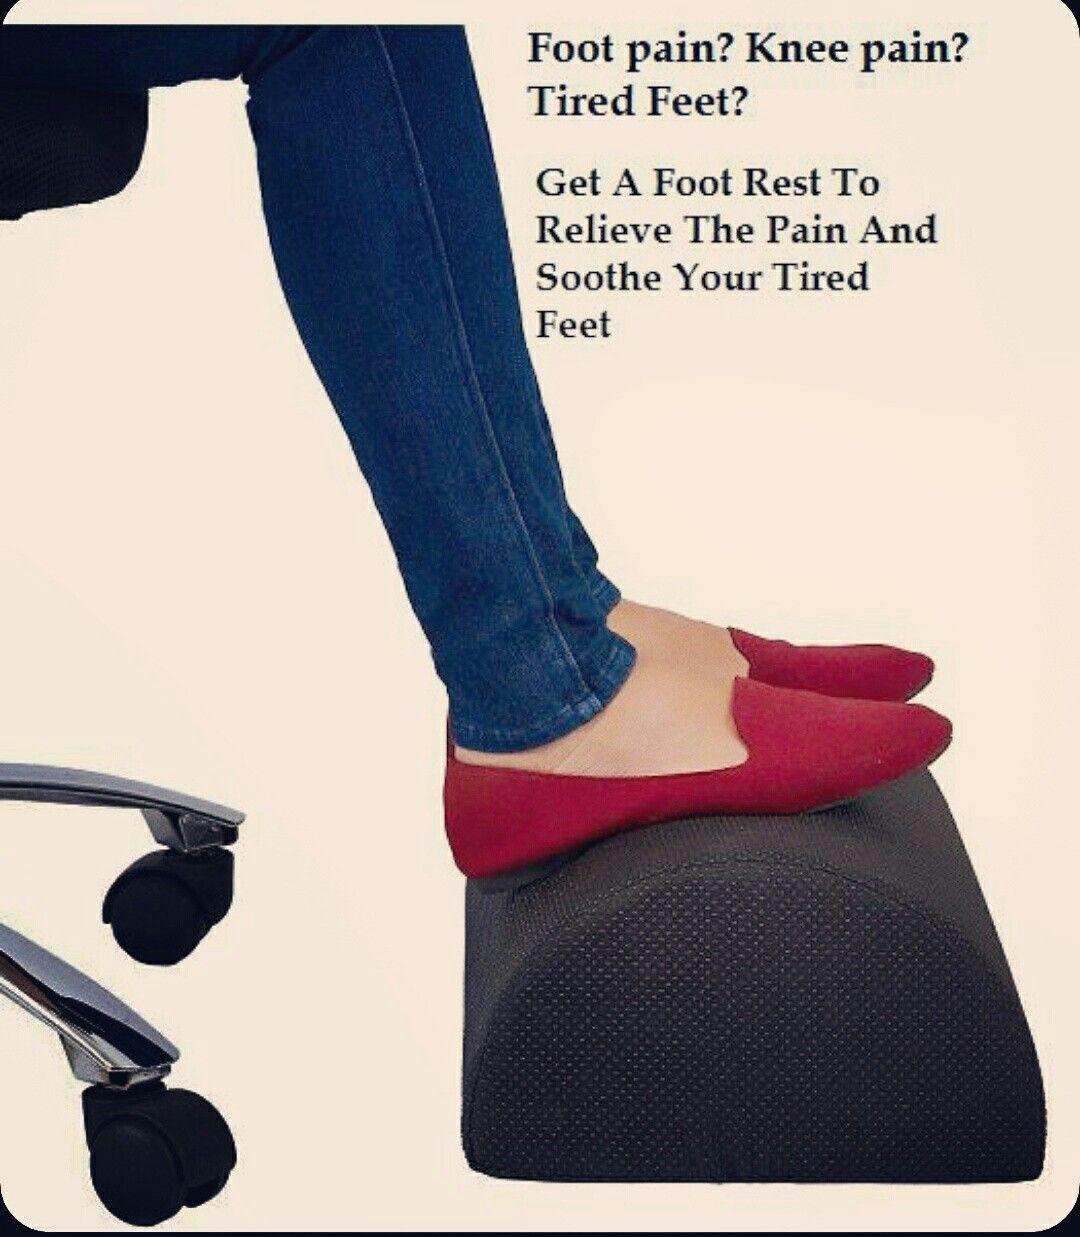 Pin by Barbara on Health & Wellbeing   Knee pain, Sore feet, Leg pain